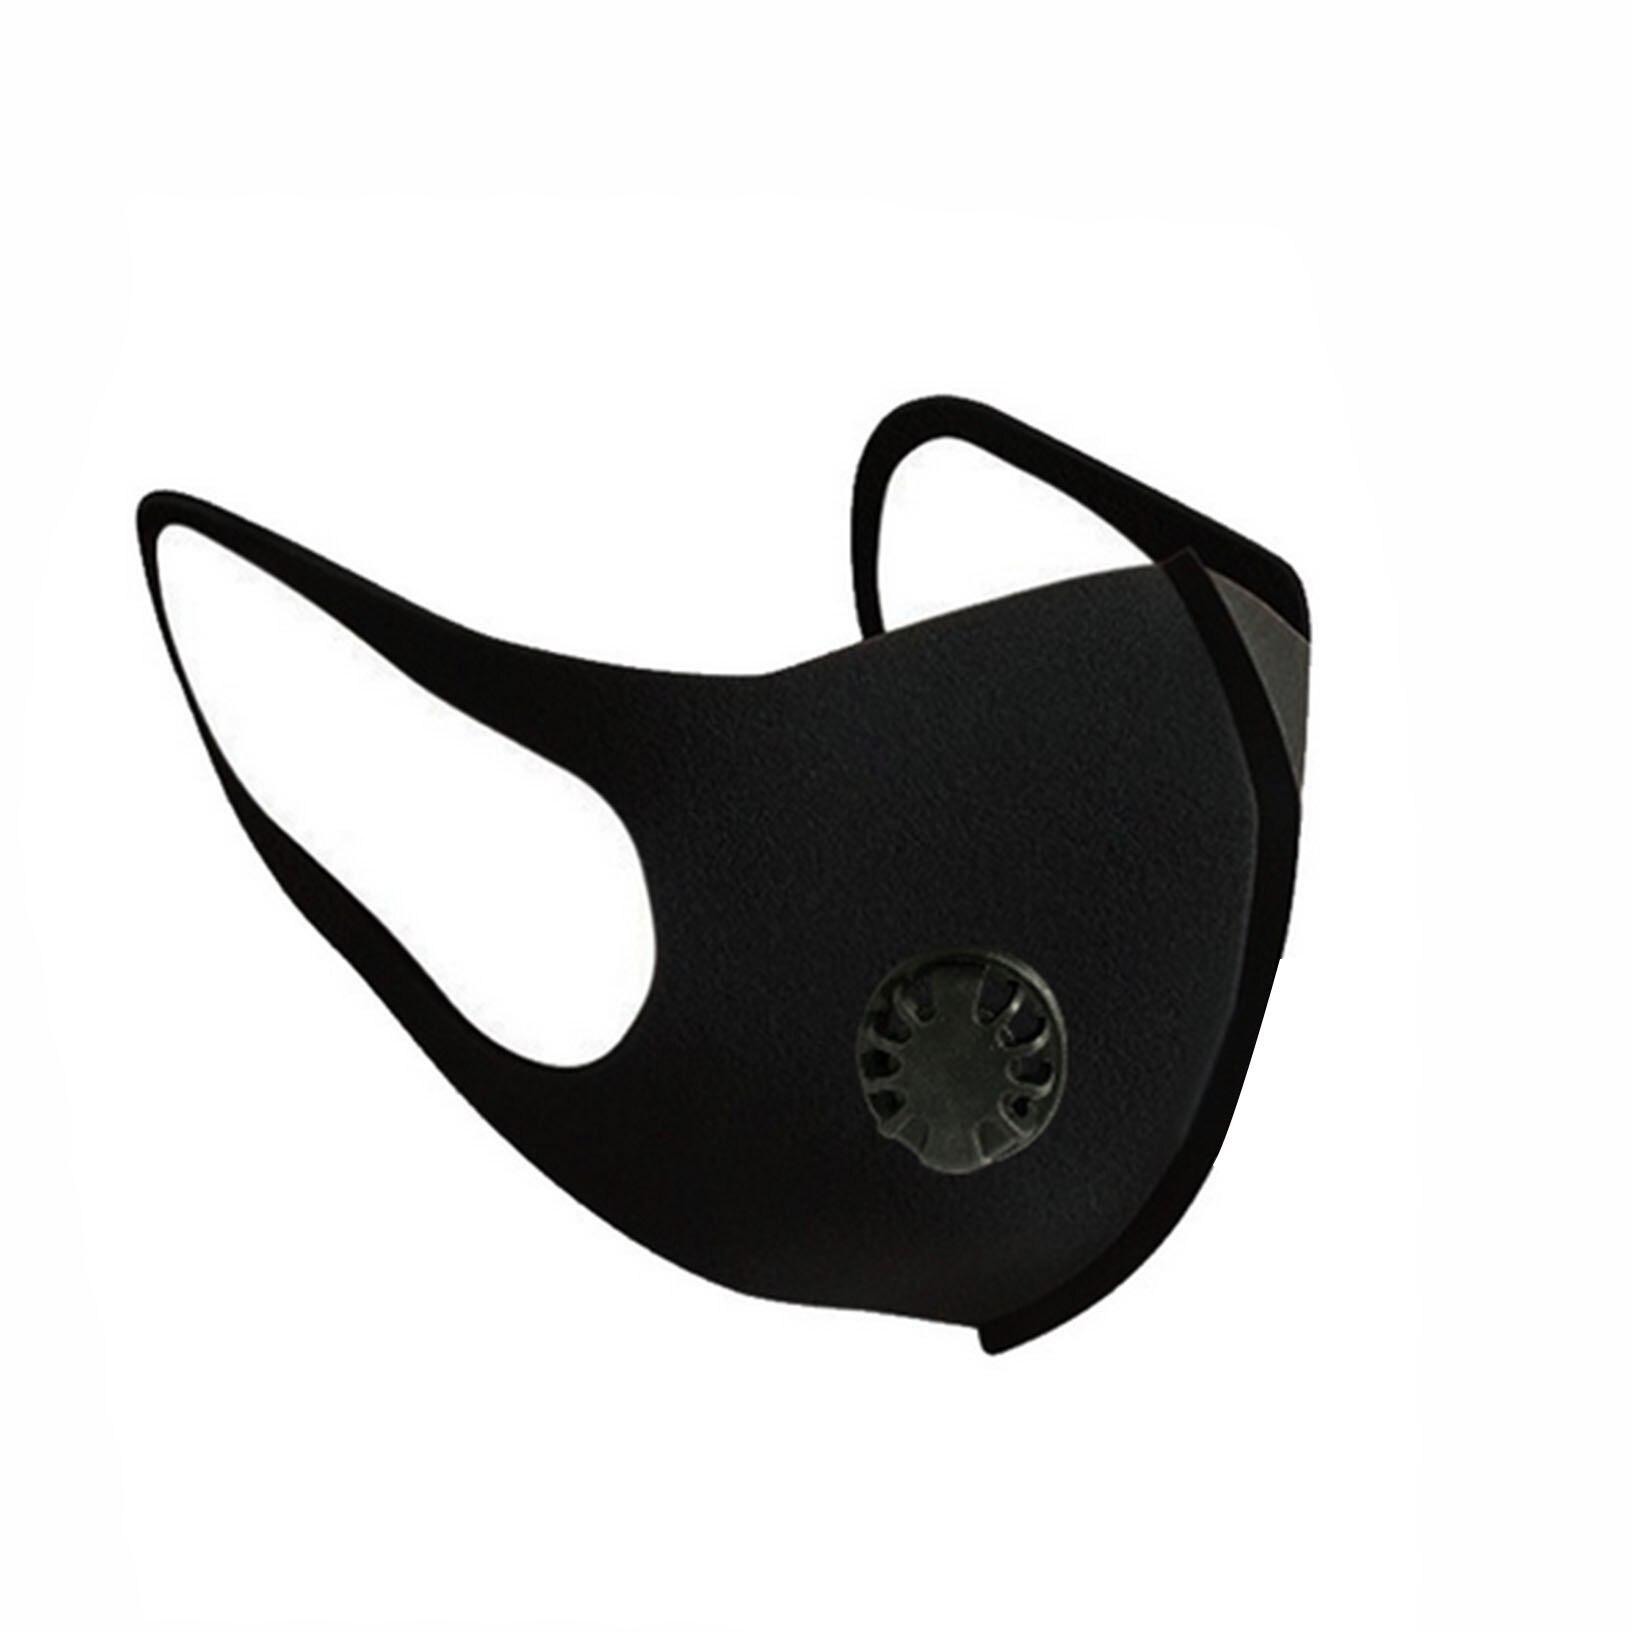 Outdoor Anti Smoke Dust Air Purifying Face Mask Unisex Single Valve